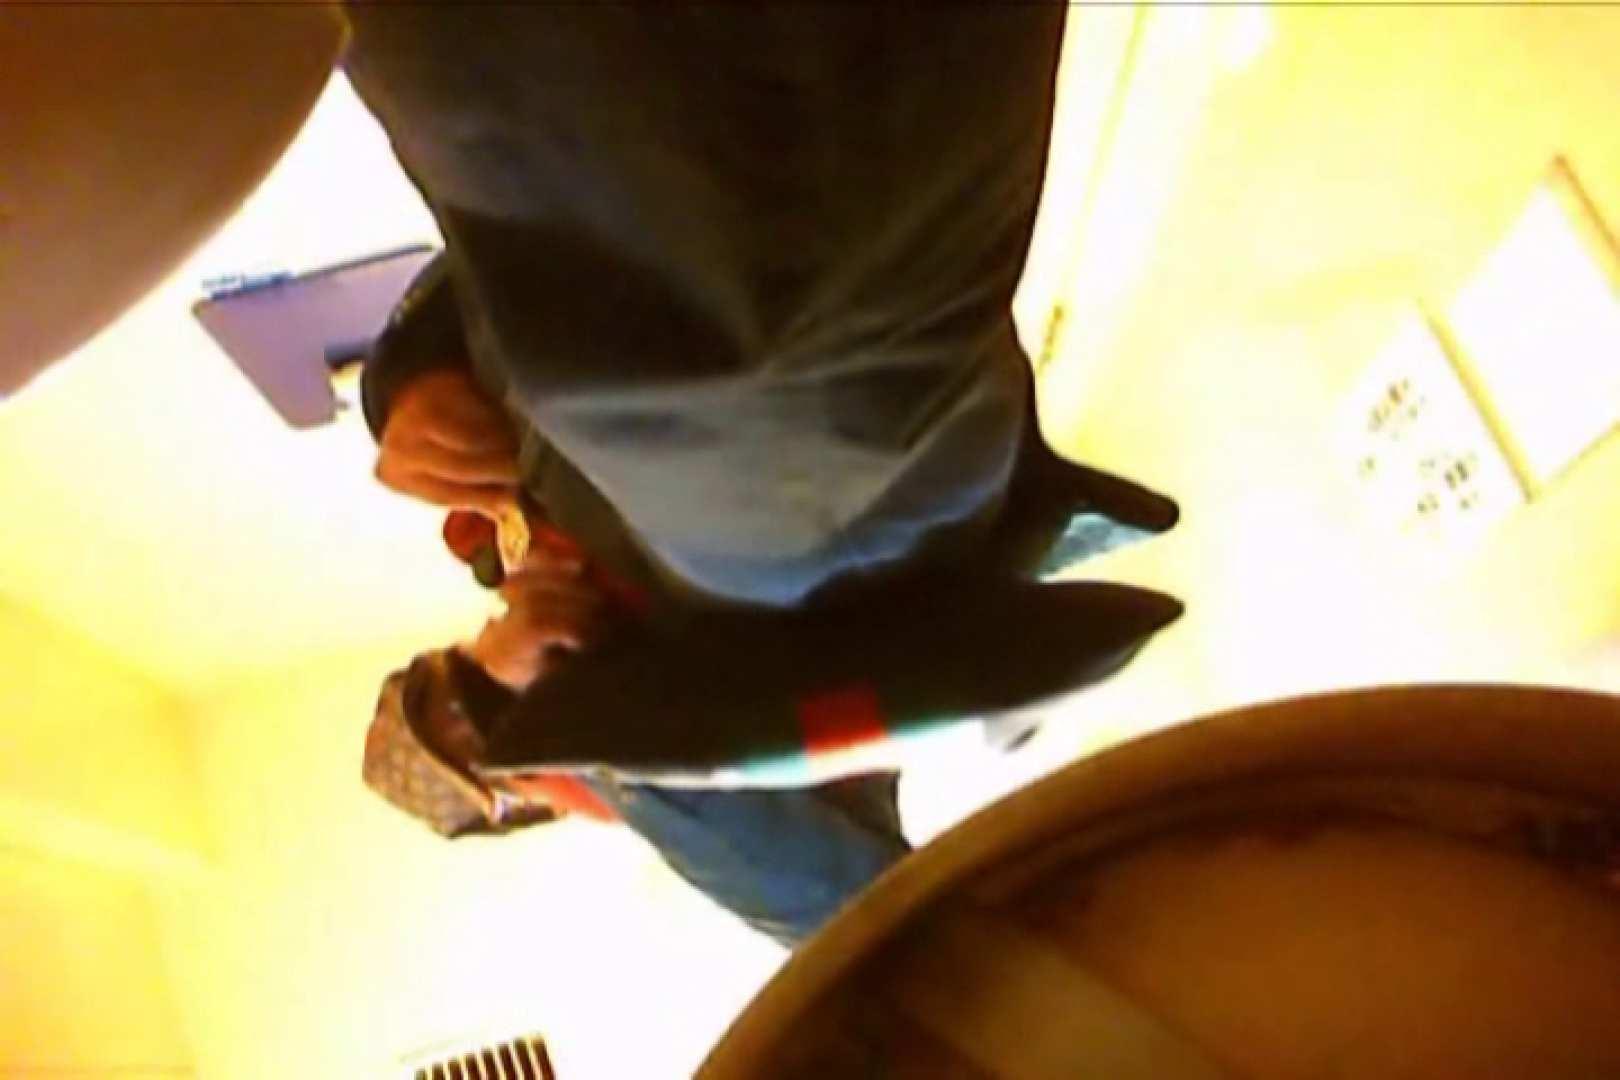 SEASON 2ND!掴み取りさんの洗面所覗き!in新幹線!VOL.13 リーマン系ボーイズ | 人気シリーズ  80pic 33